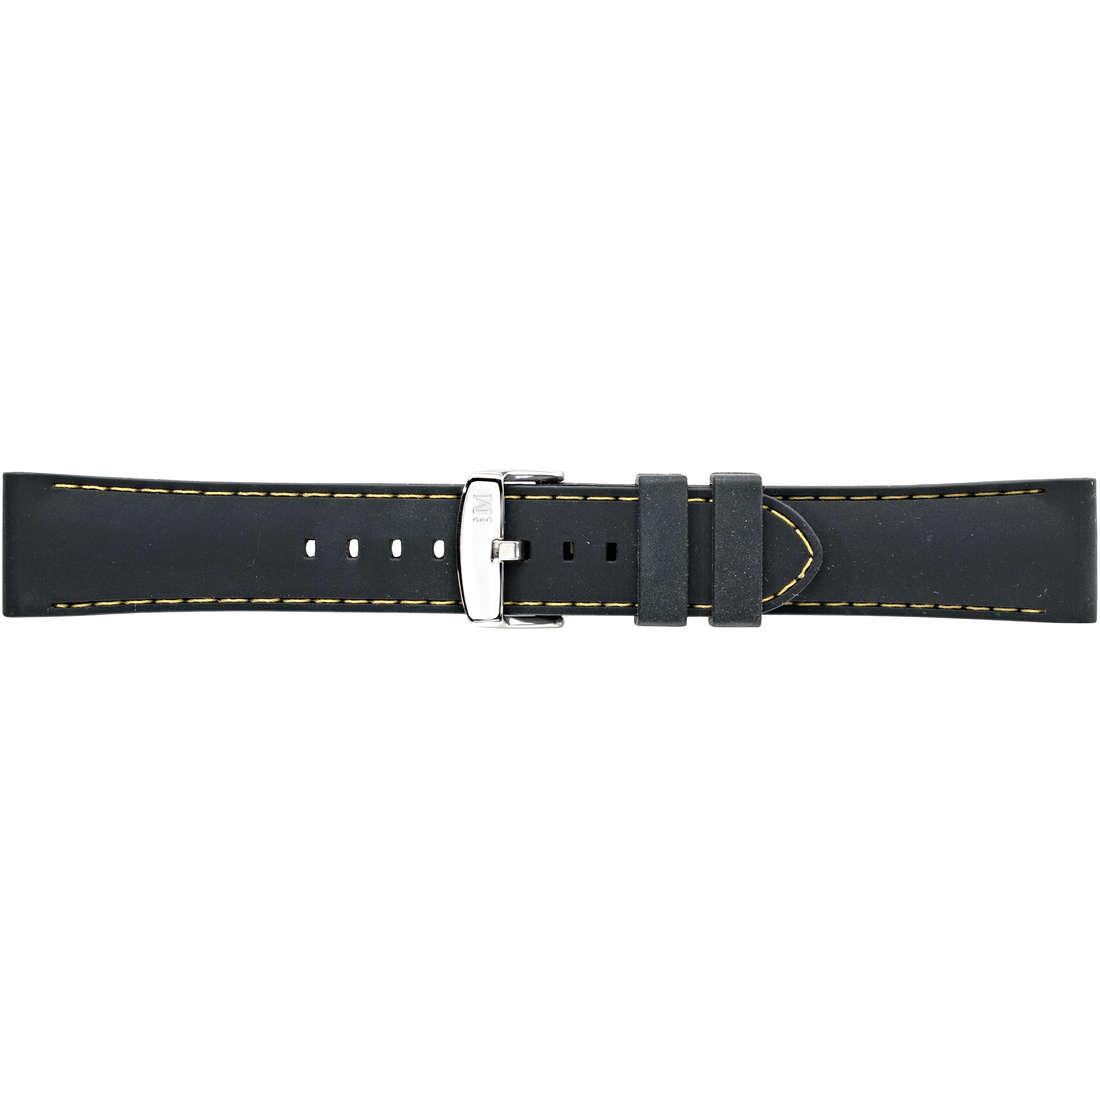 montre bande de montres homme Morellato Technogomma A01U3844187897CR20